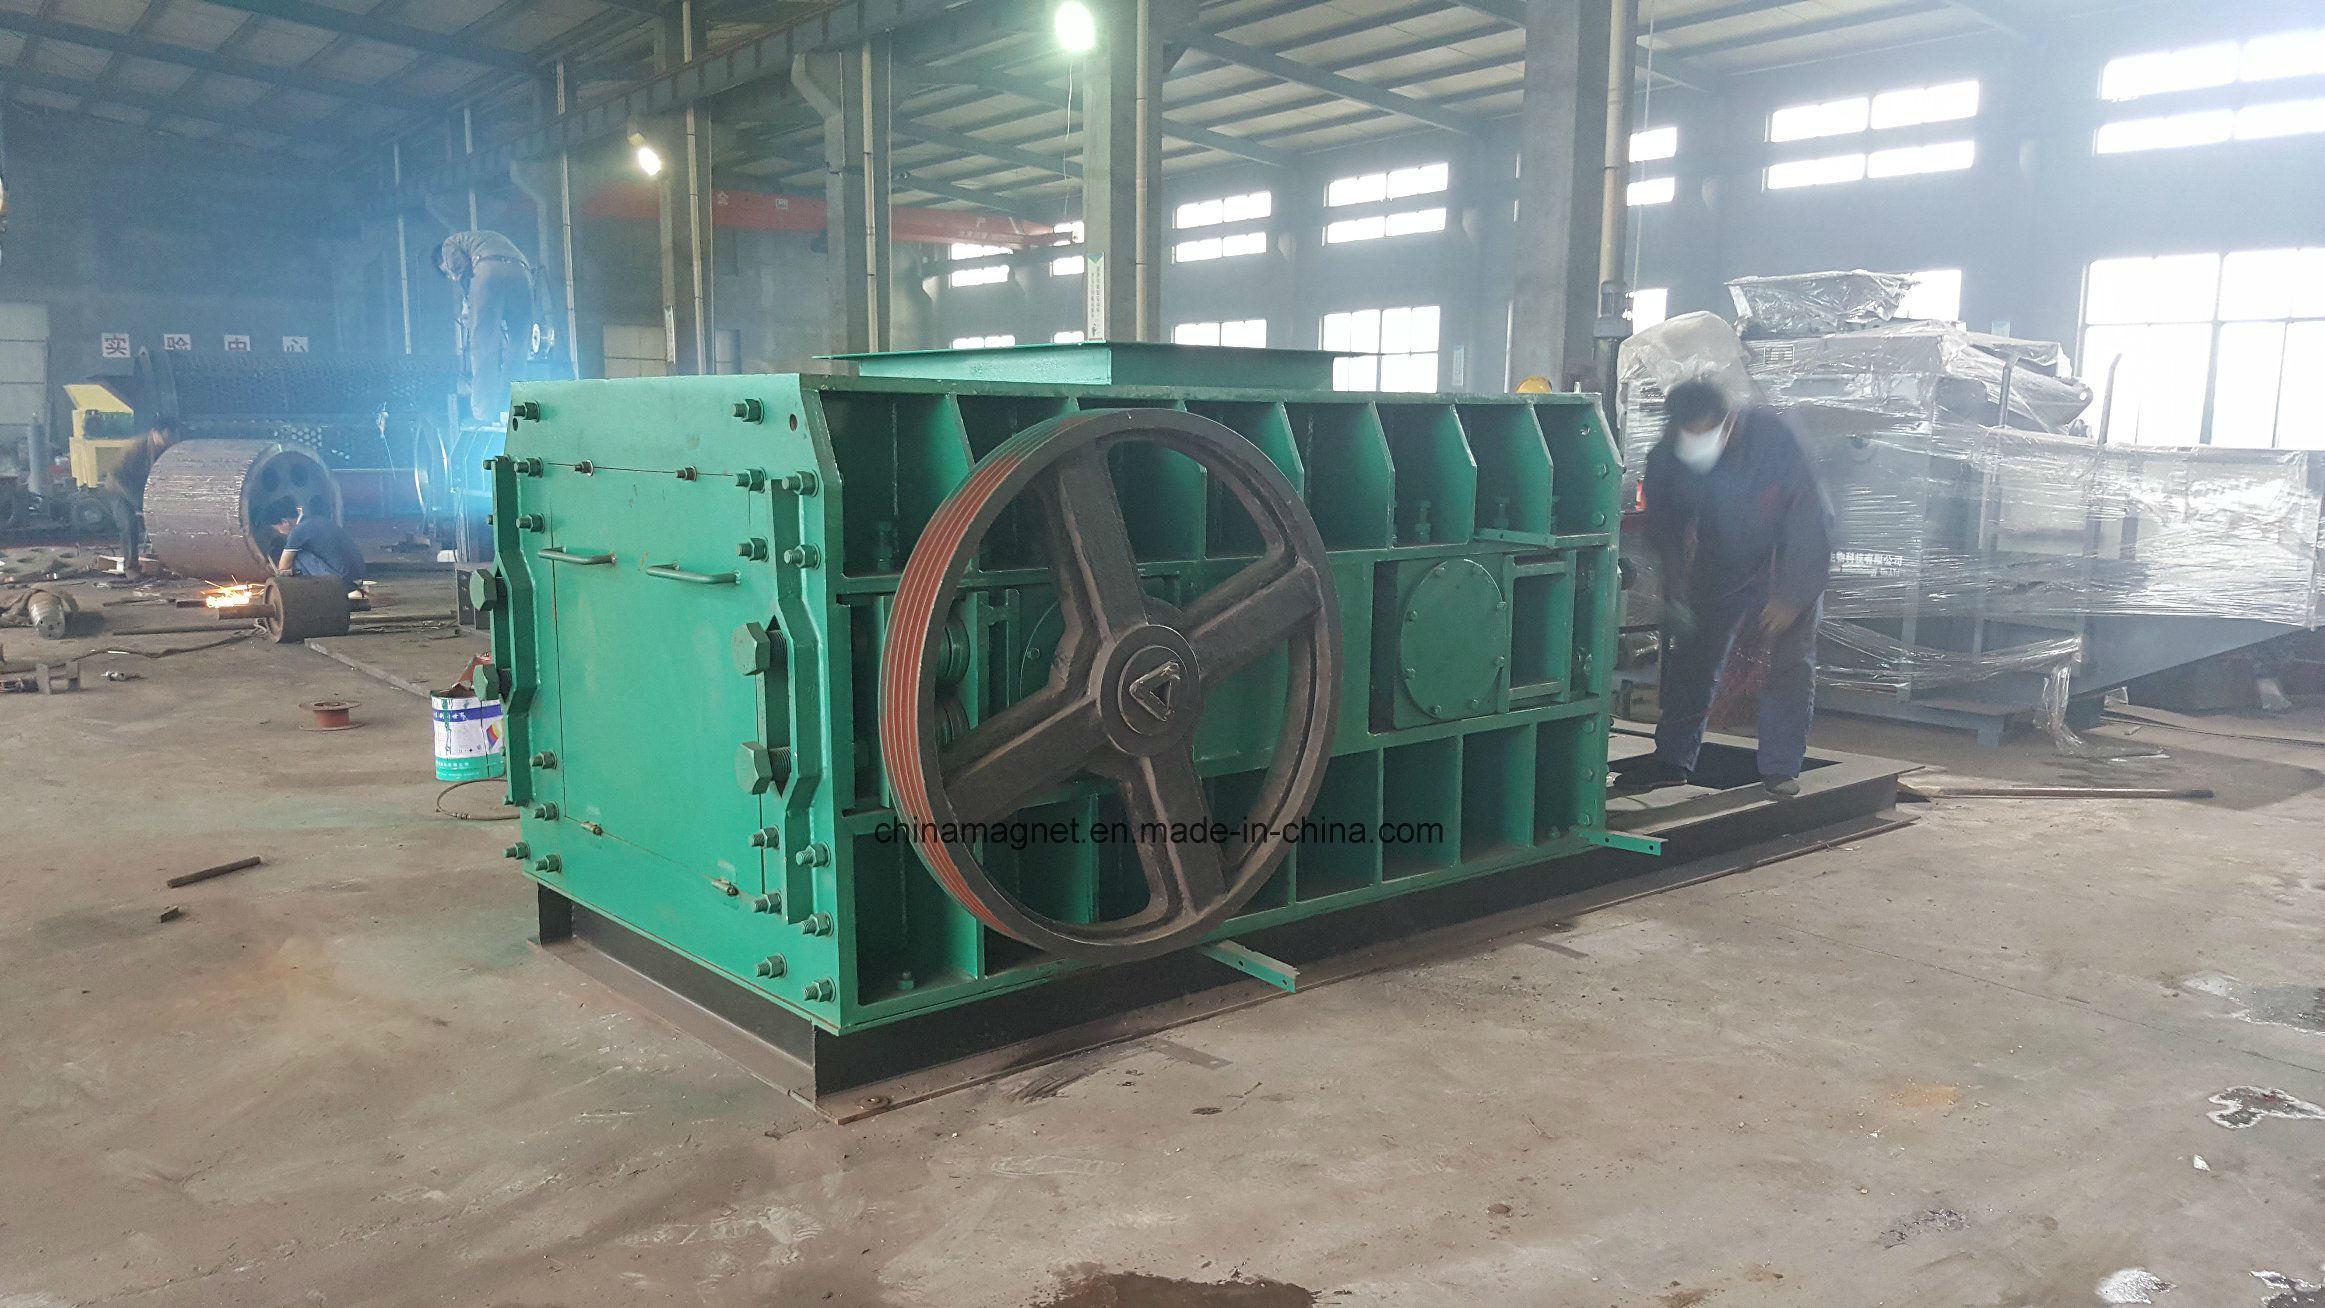 2pg Mining Crusher/Roller Crusher/Double Roll Crushing Machine for Coal/Coke/Refactory Material Crushing